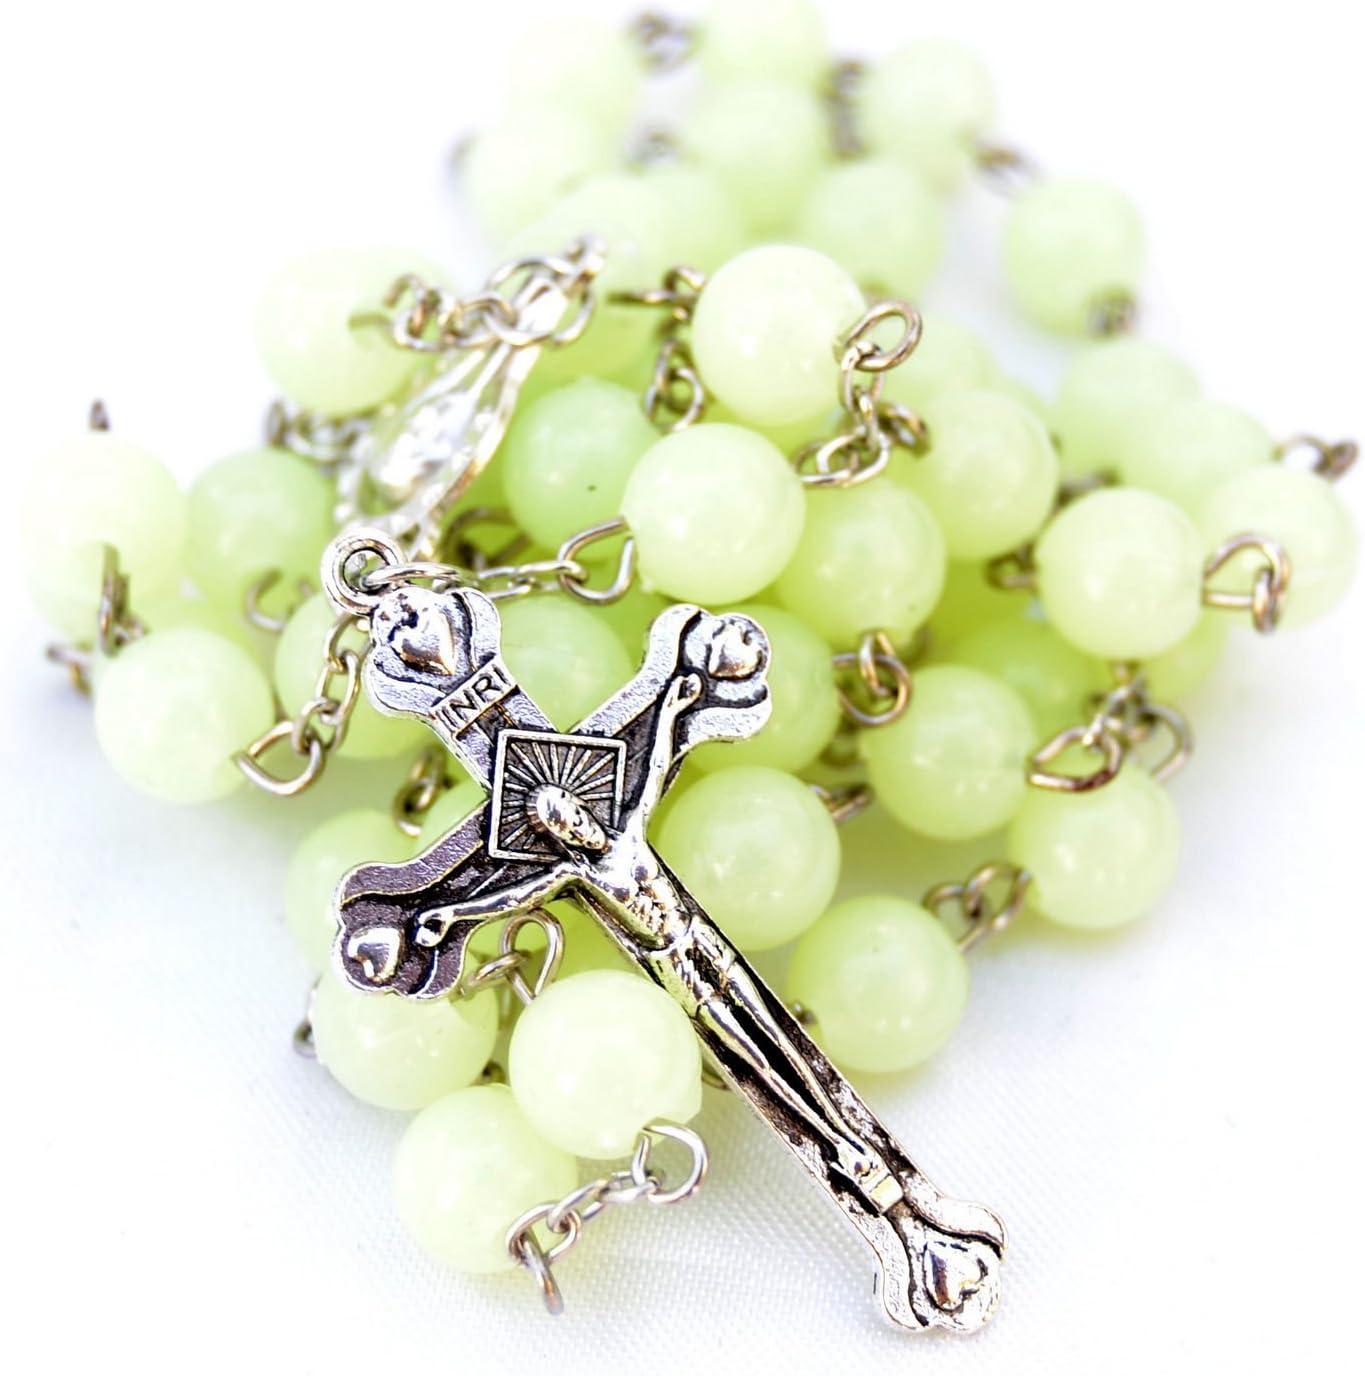 Plastic basic rosary beads necklace glow in the dark luminous